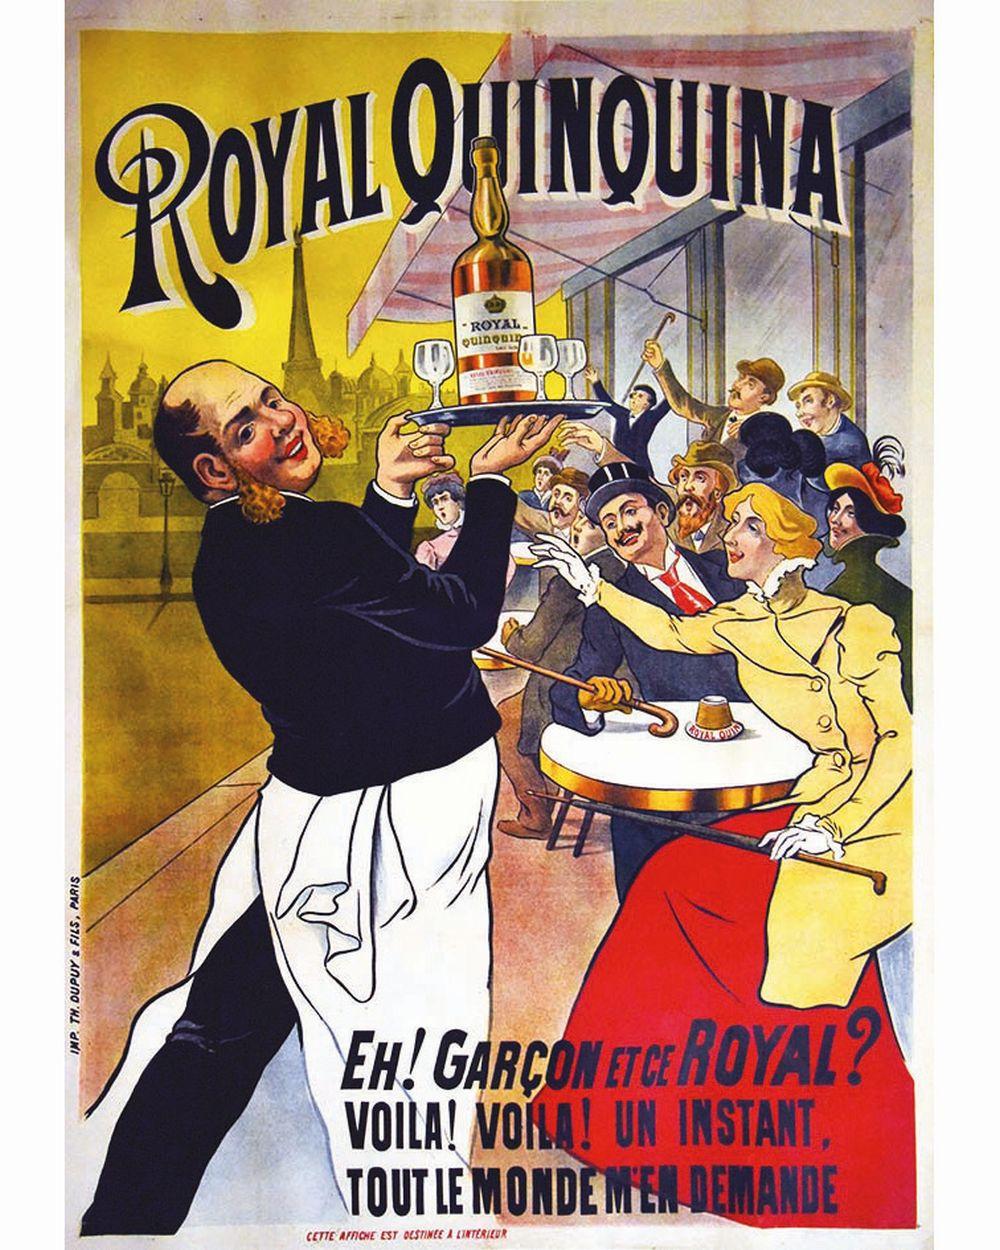 Royal Quinquina Eh !Garçon et ce Royal     vers 1890